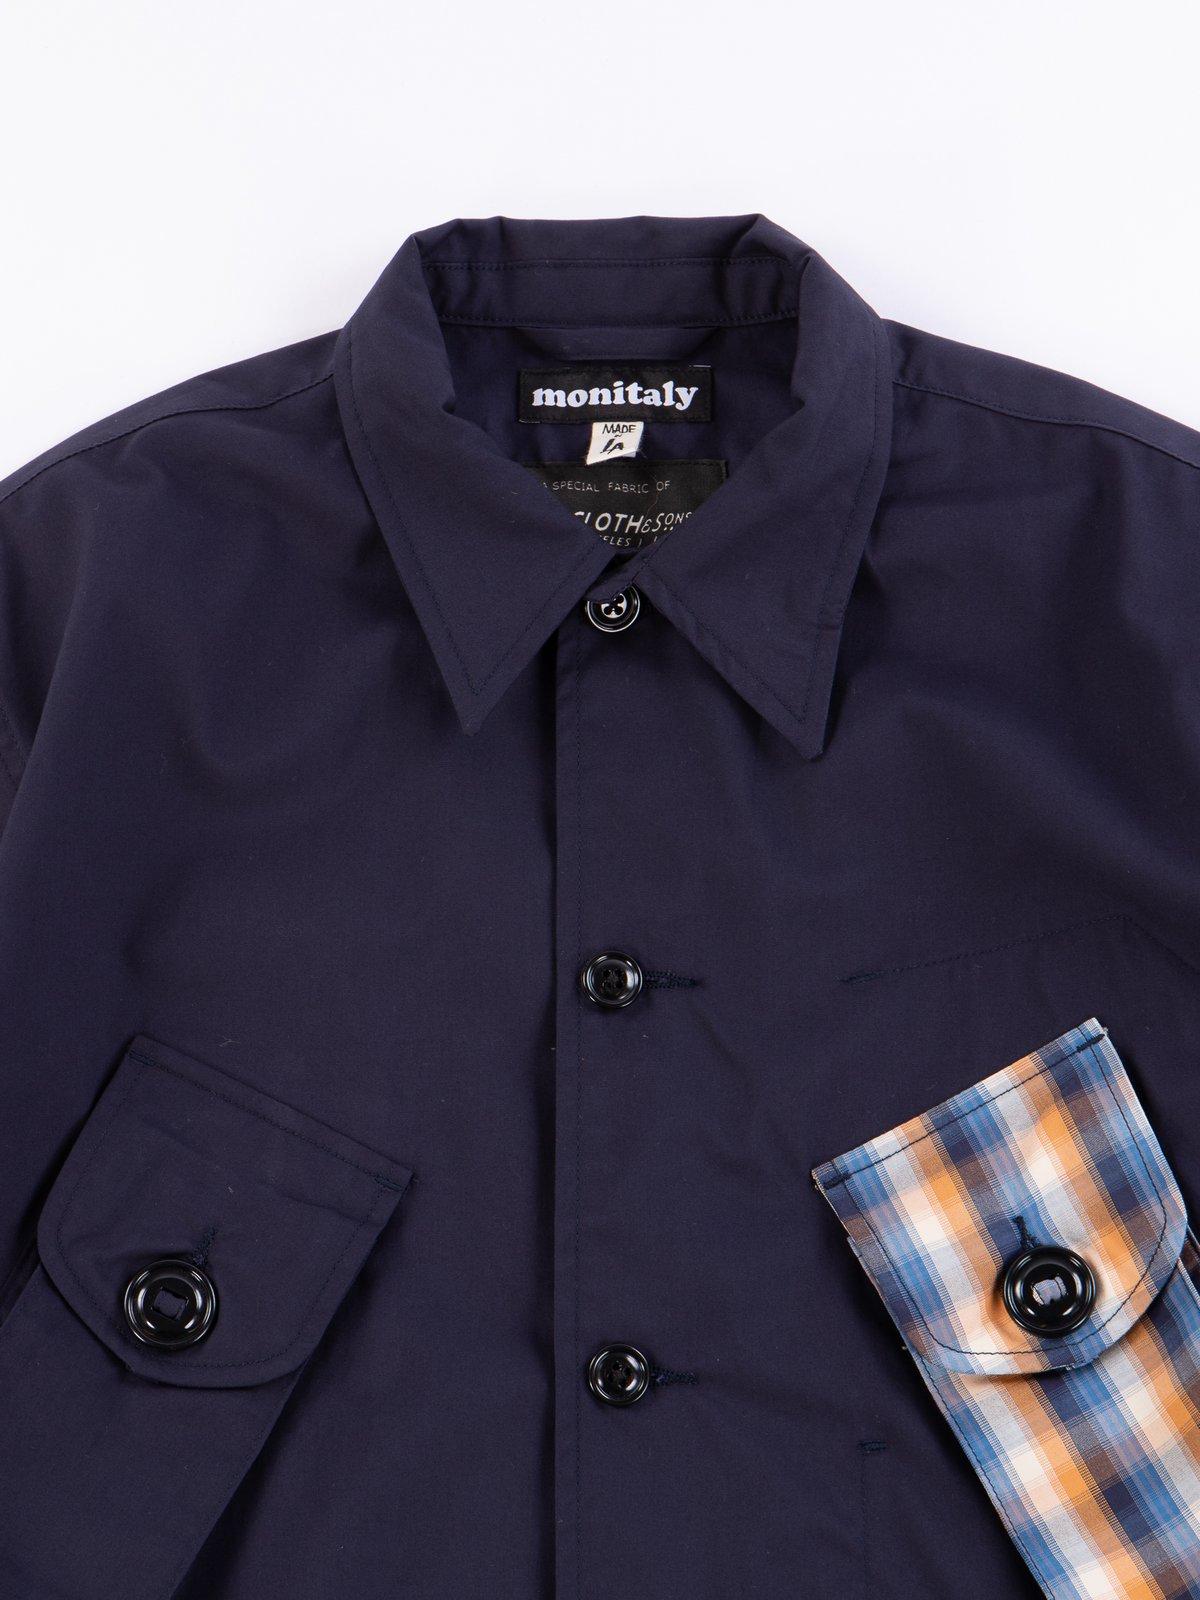 Navy Vancloth Oxford Military Half Coat Type B Exclusive - Image 3